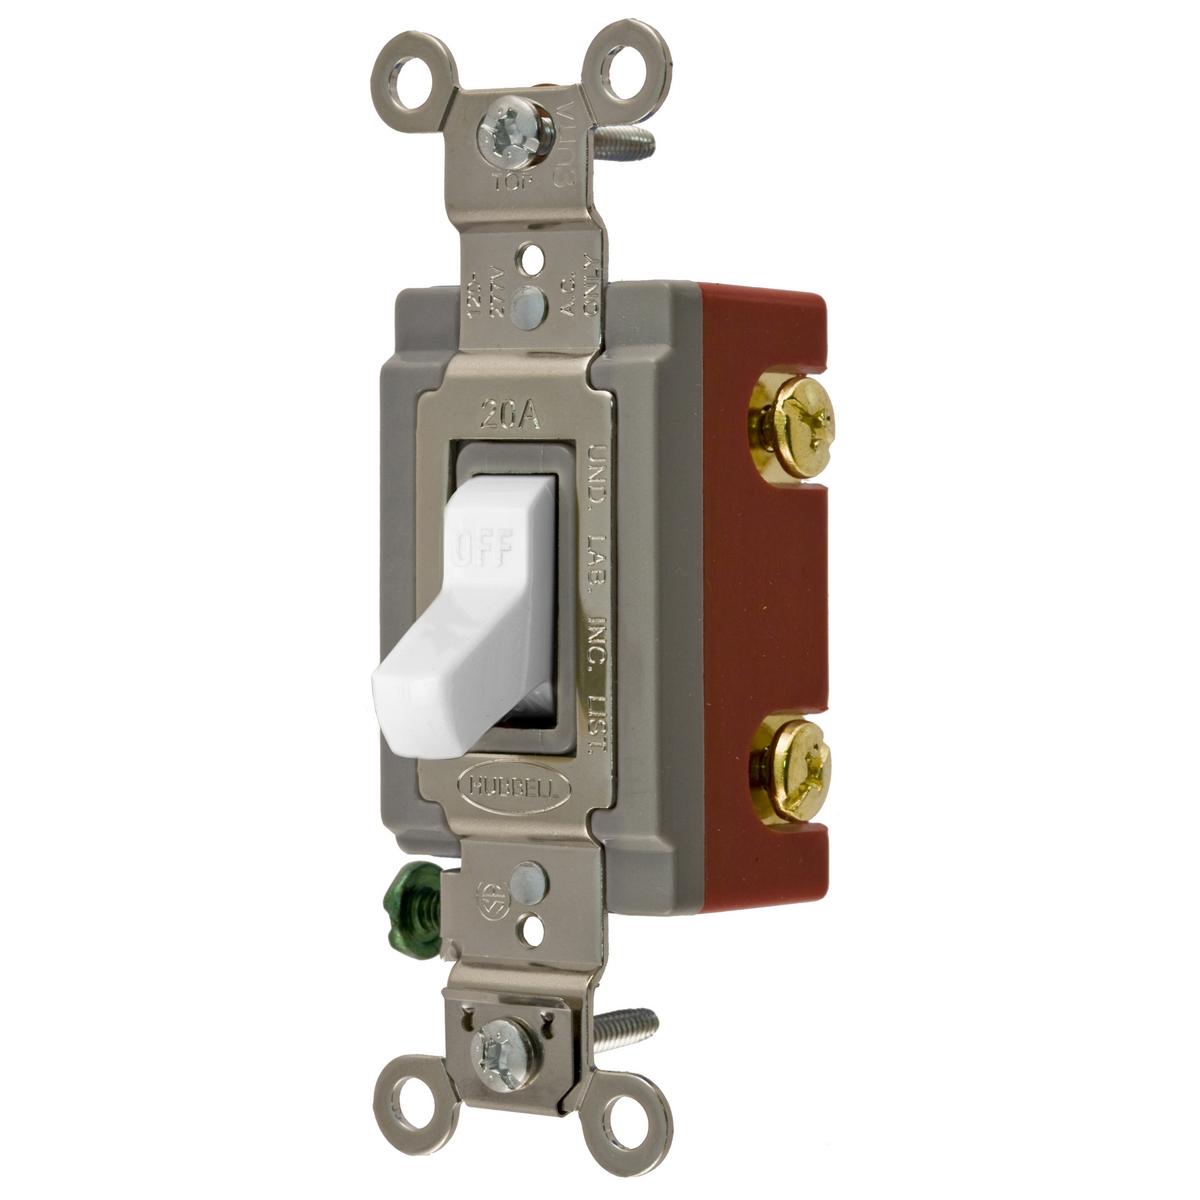 Hubbell CS1221WU USA 120/277 Volt 20 Amp 1-Pole White Construction Grade Toggle Switch